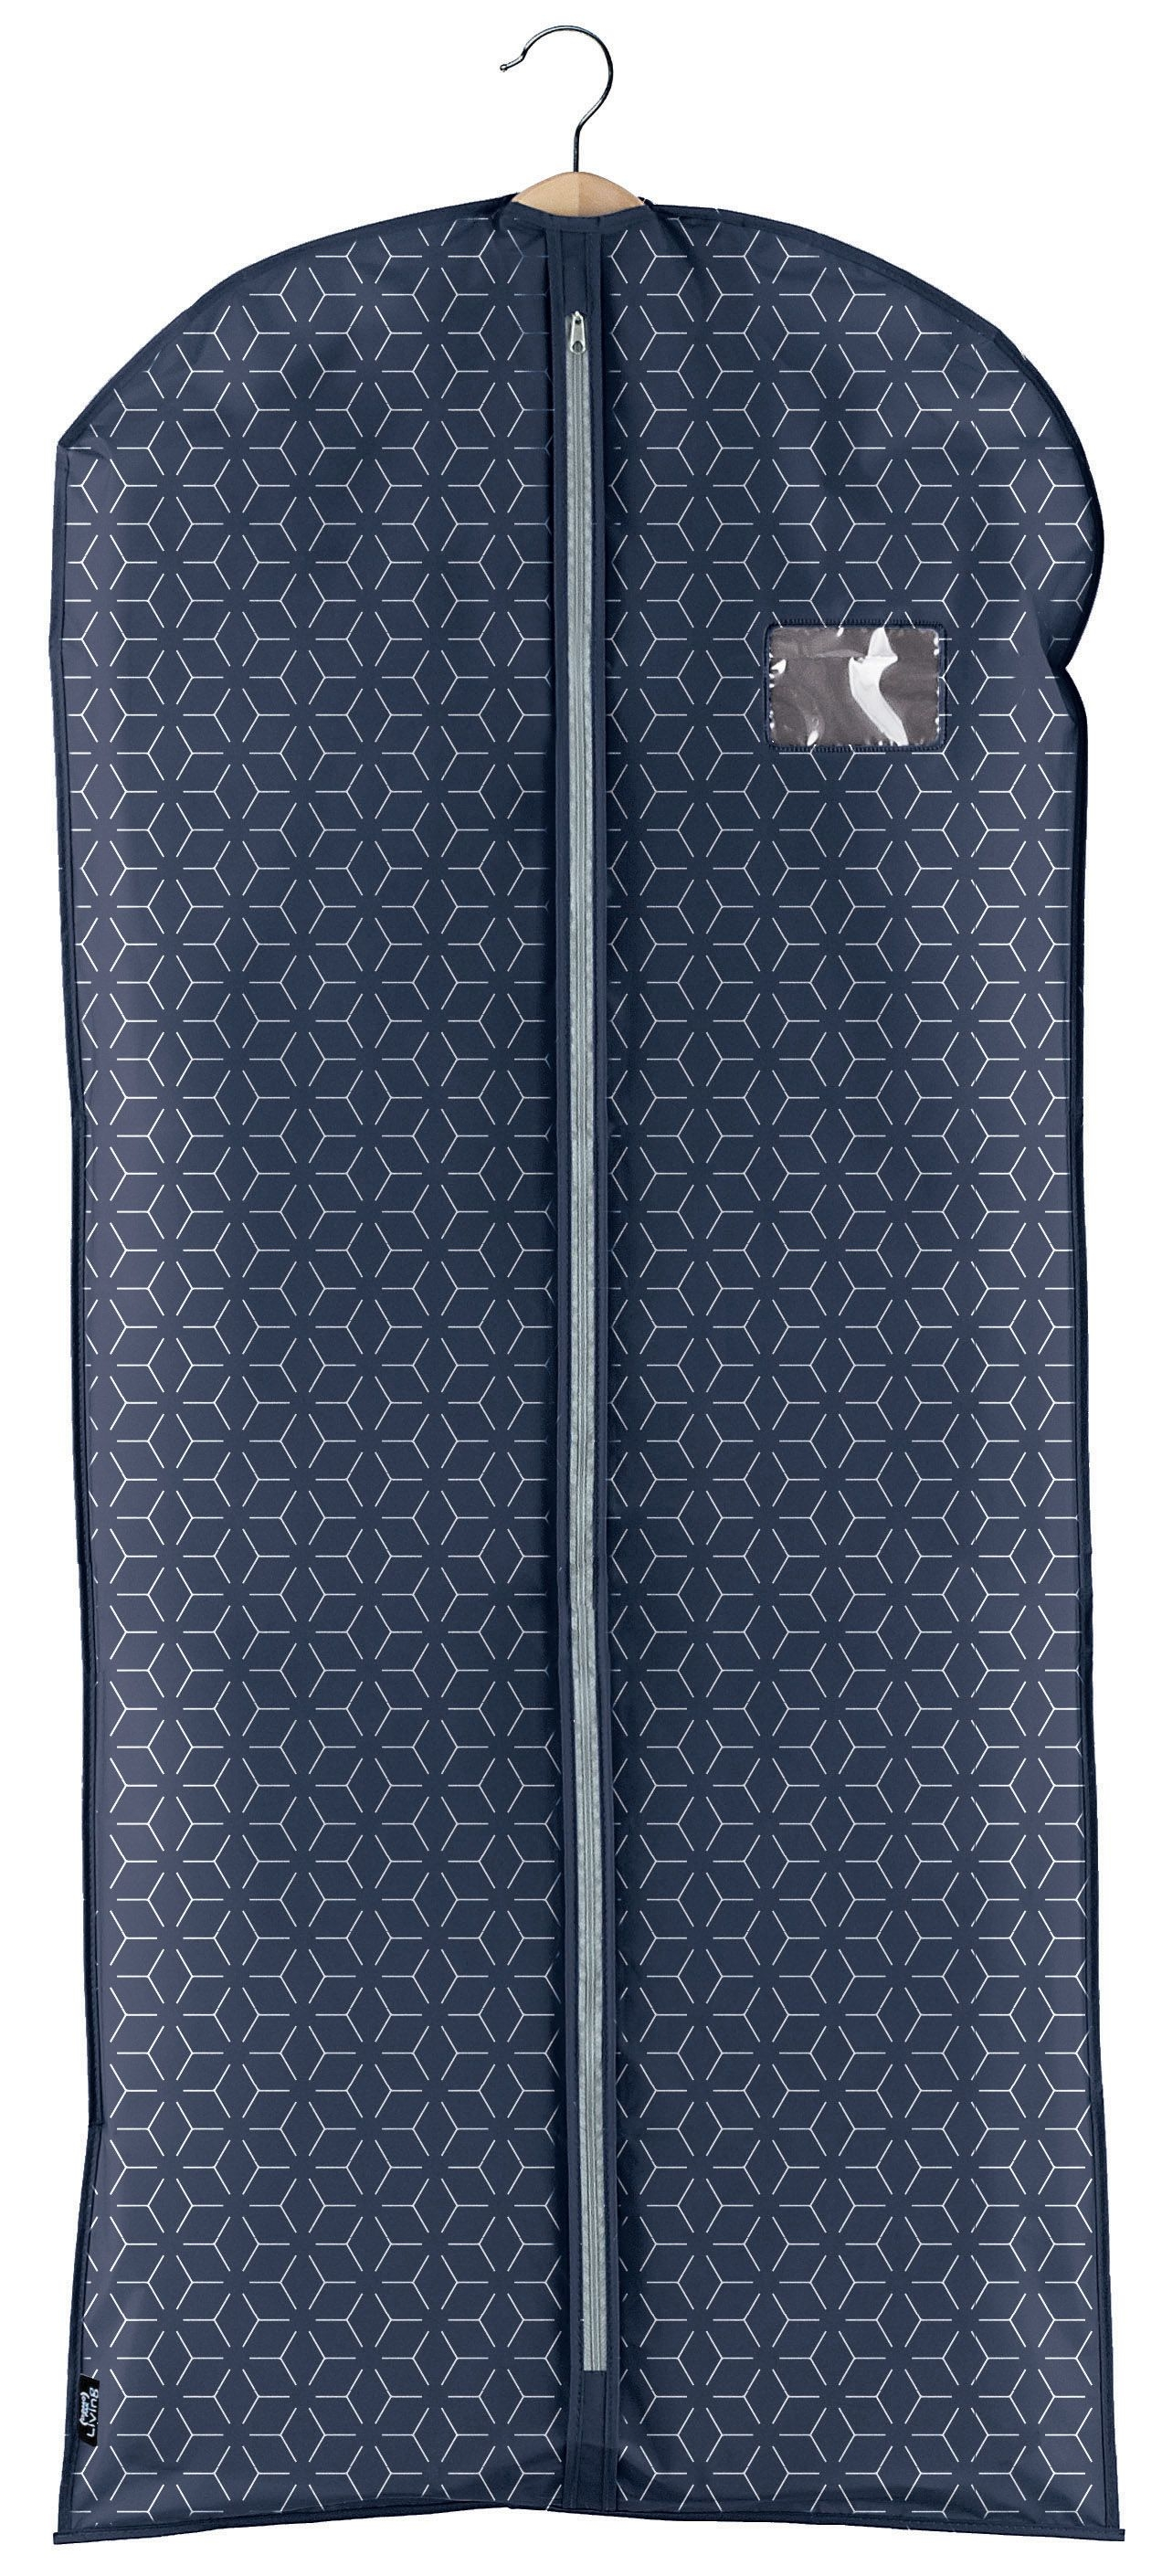 Husa pentru haine cu fermoar, Metrik XL Bleumarin, l60xH135 cm imagine